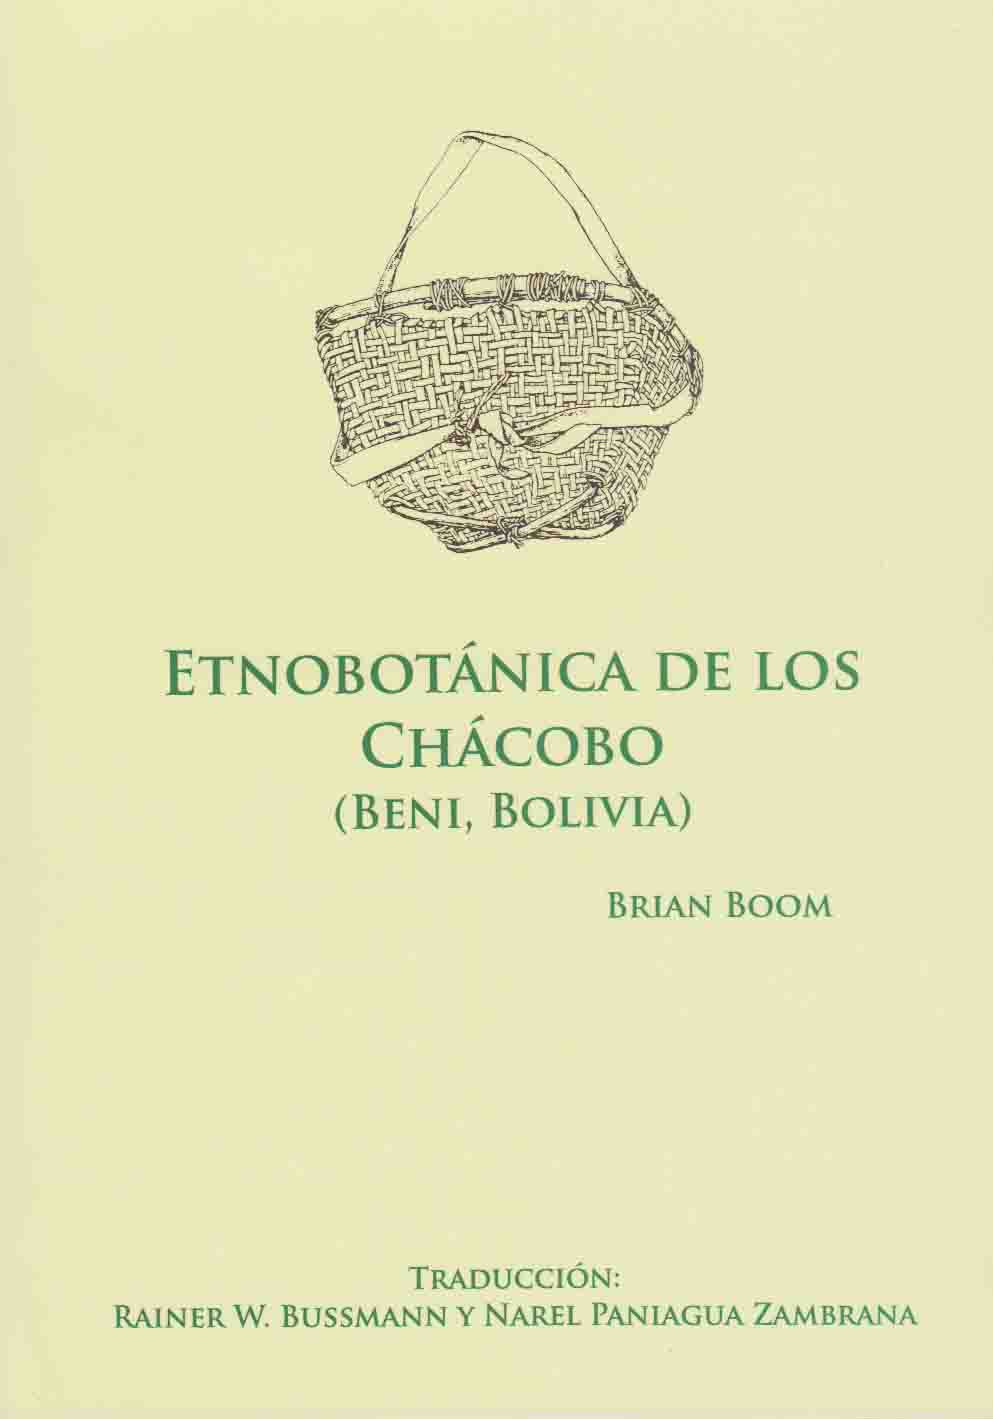 https://www.researchgate.net/publication/261985682_Etnobotanica_de_los_Chacobo_Beni_Bolivia_-_una_traduccion_de_la_publicacion_Boom_B_1996_Ethnobotany_of_the_Chacobo_Indians_Beni_Bolivia